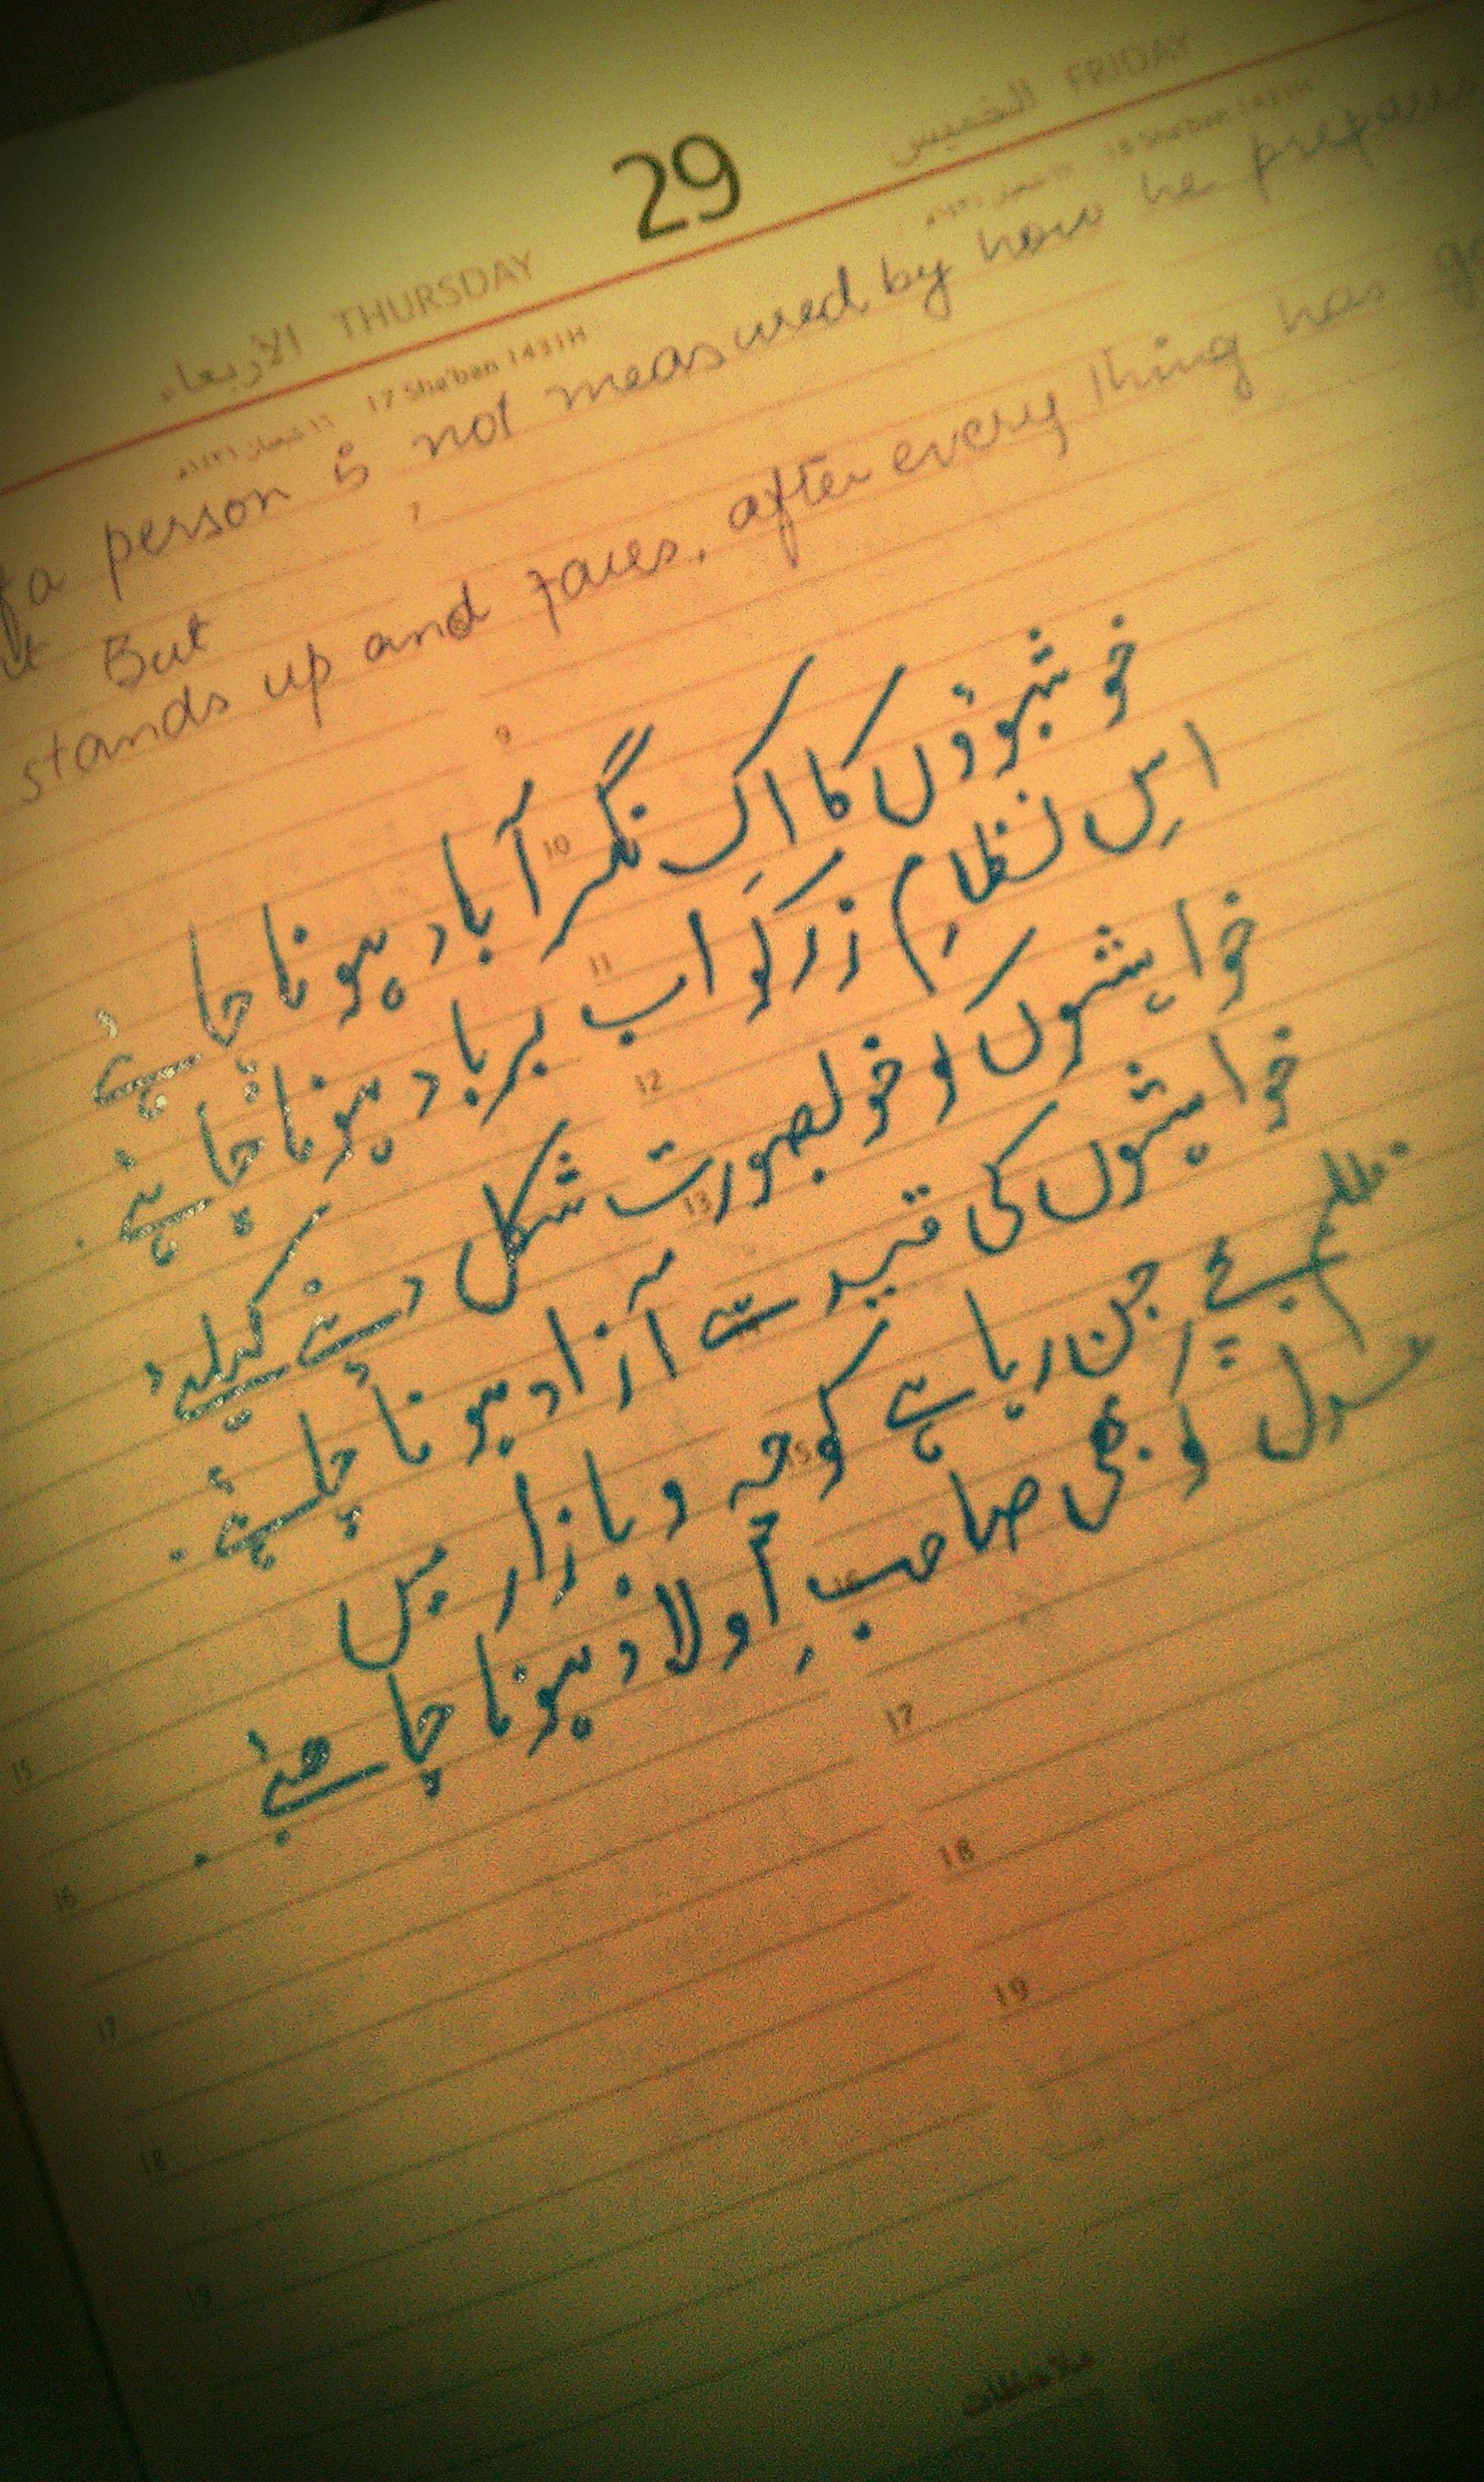 Pakistan Justice Materialism Deep Words Urdu Poetry Image Quotes